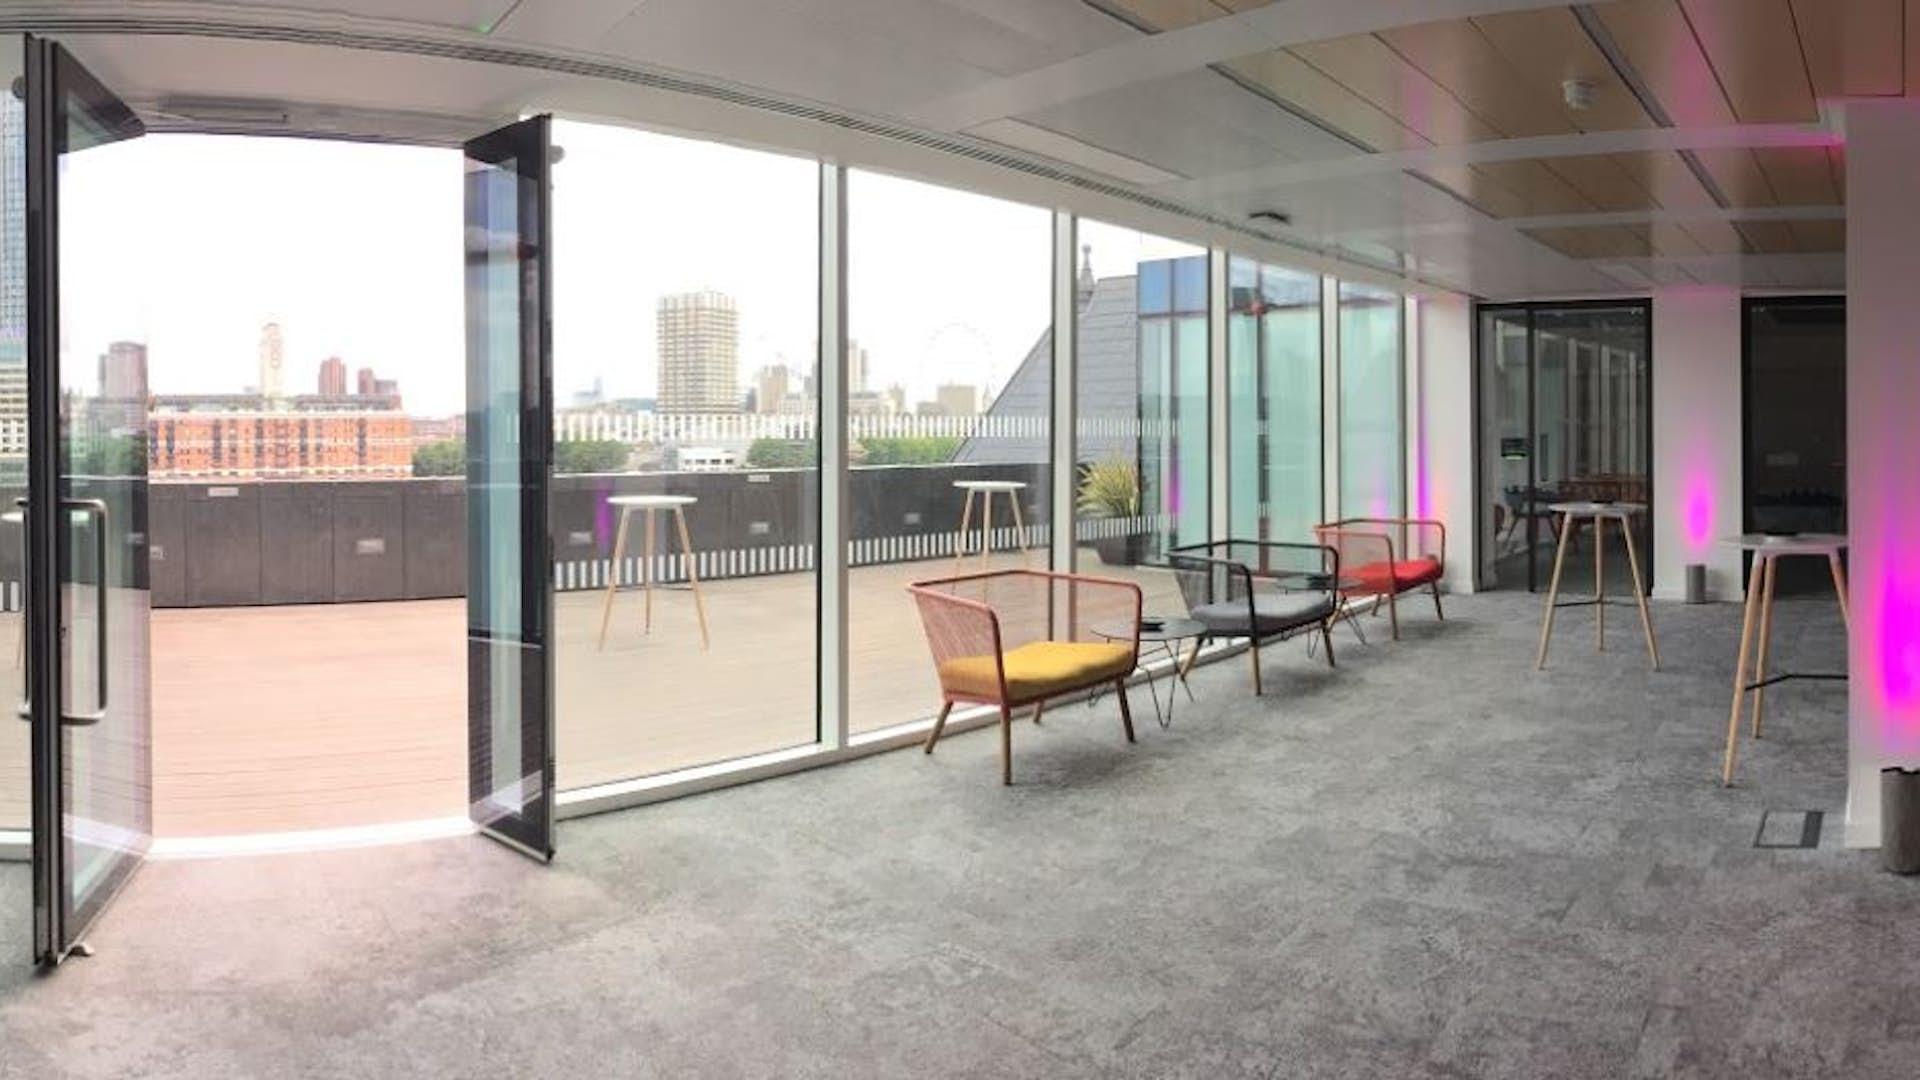 Lounge balcony film and photo 58ve for Balcony lounge